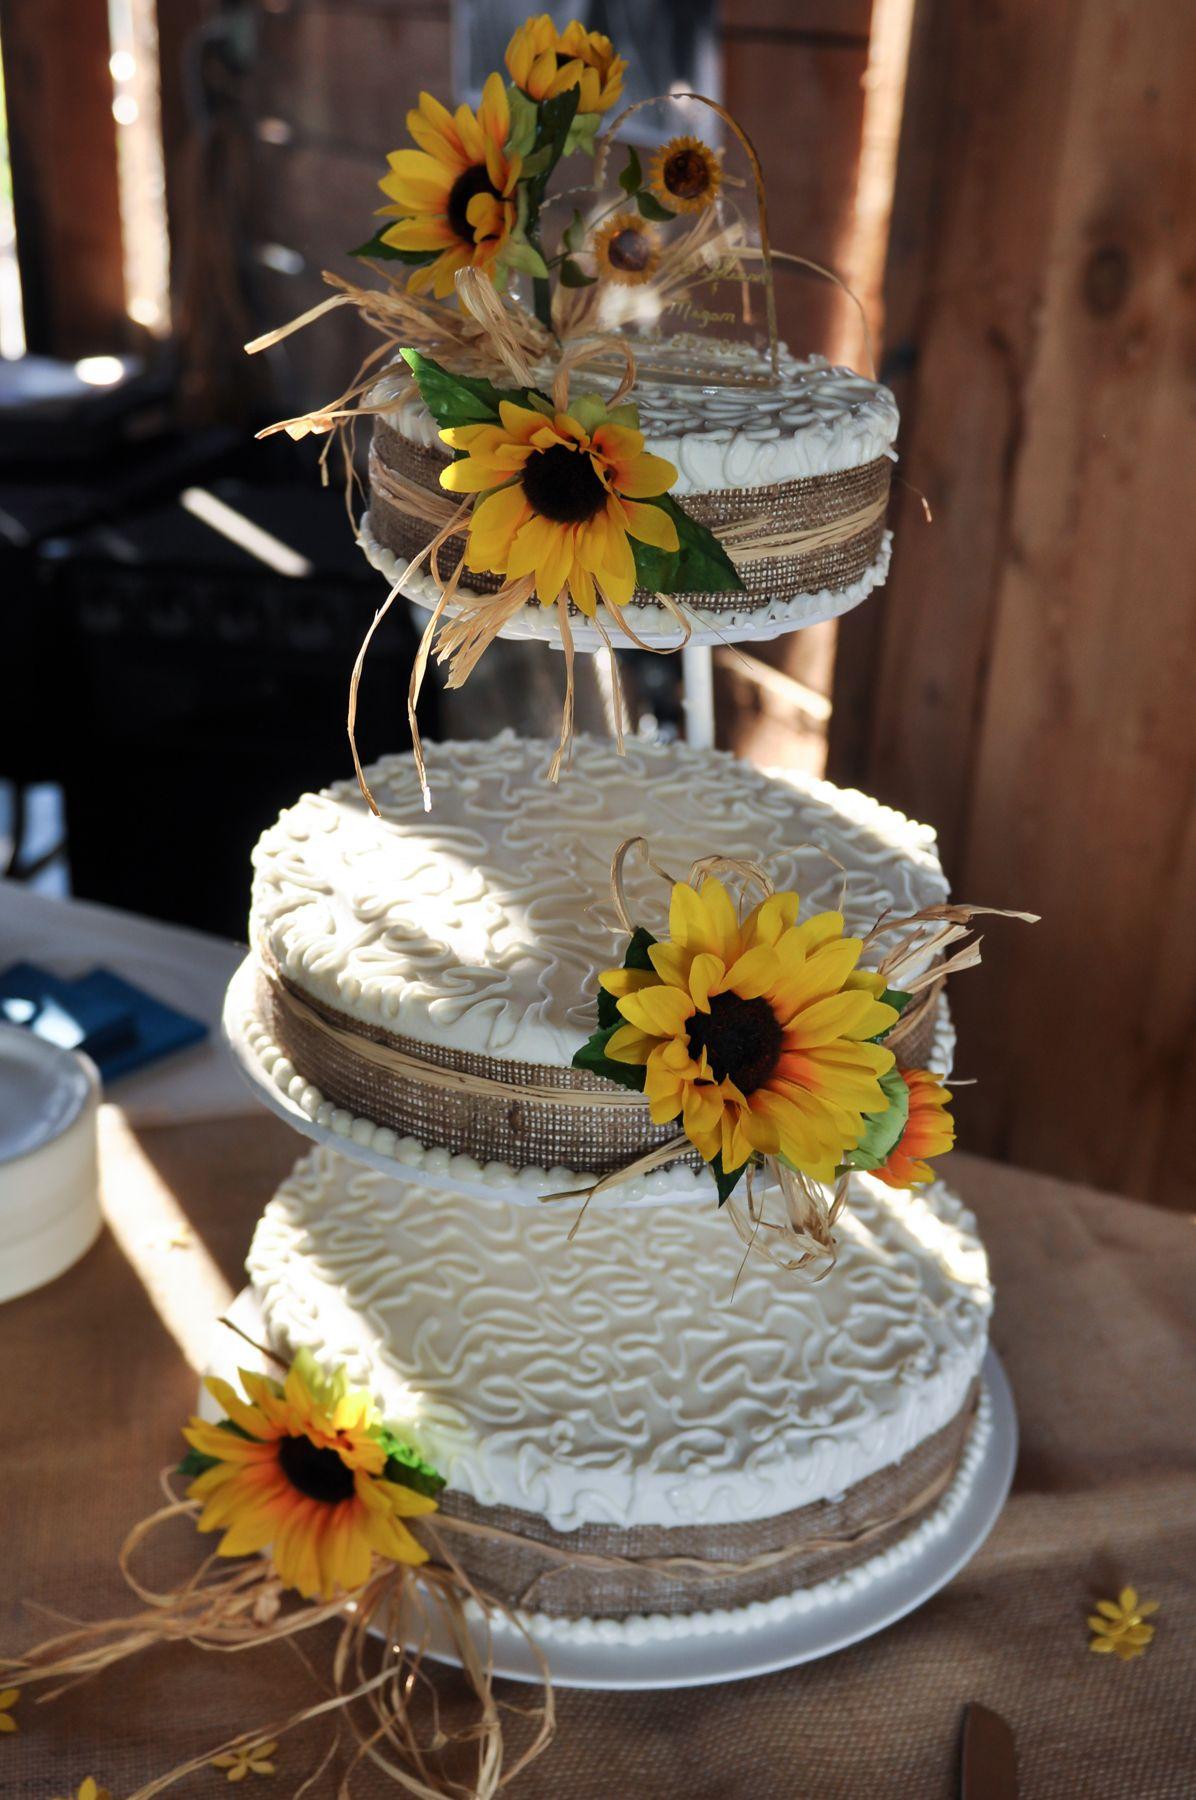 Sunflower and Burlap wedding cake (With images) Burlap